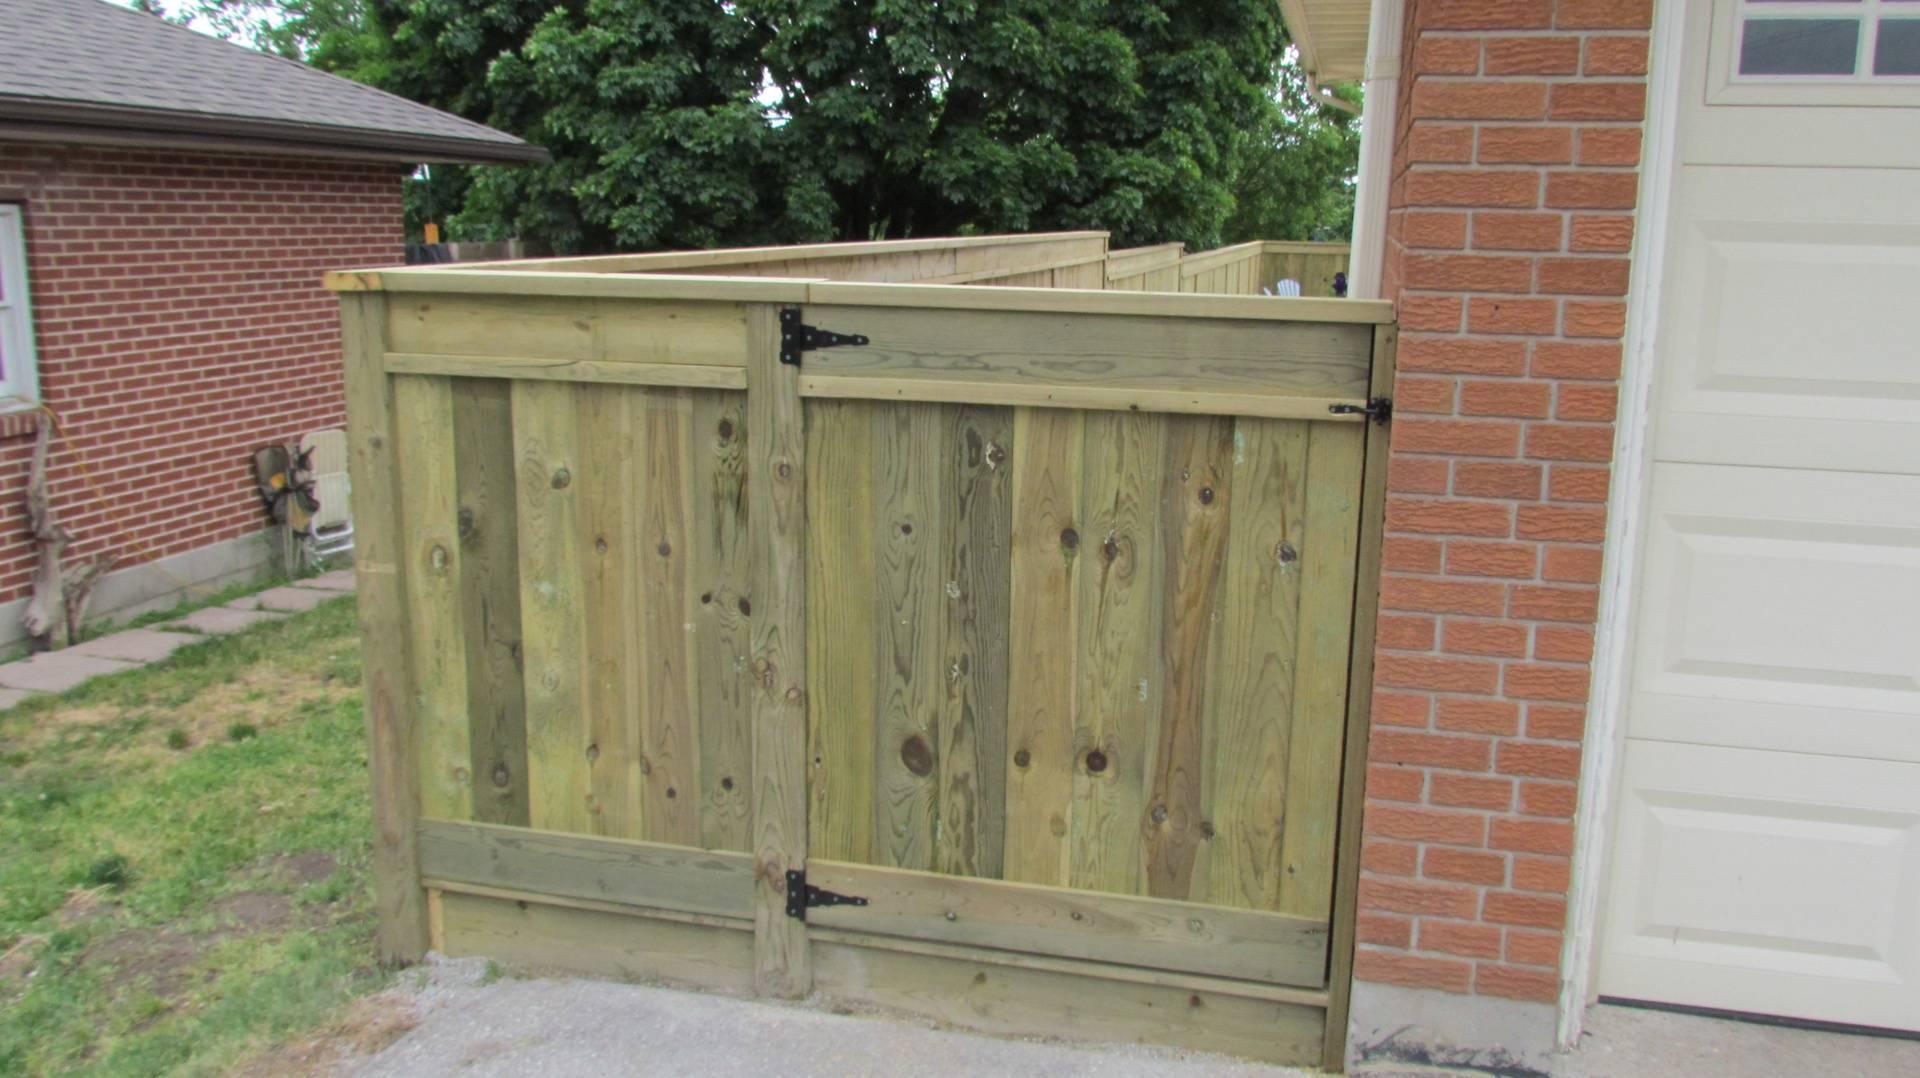 New Walkway Fence & Gate